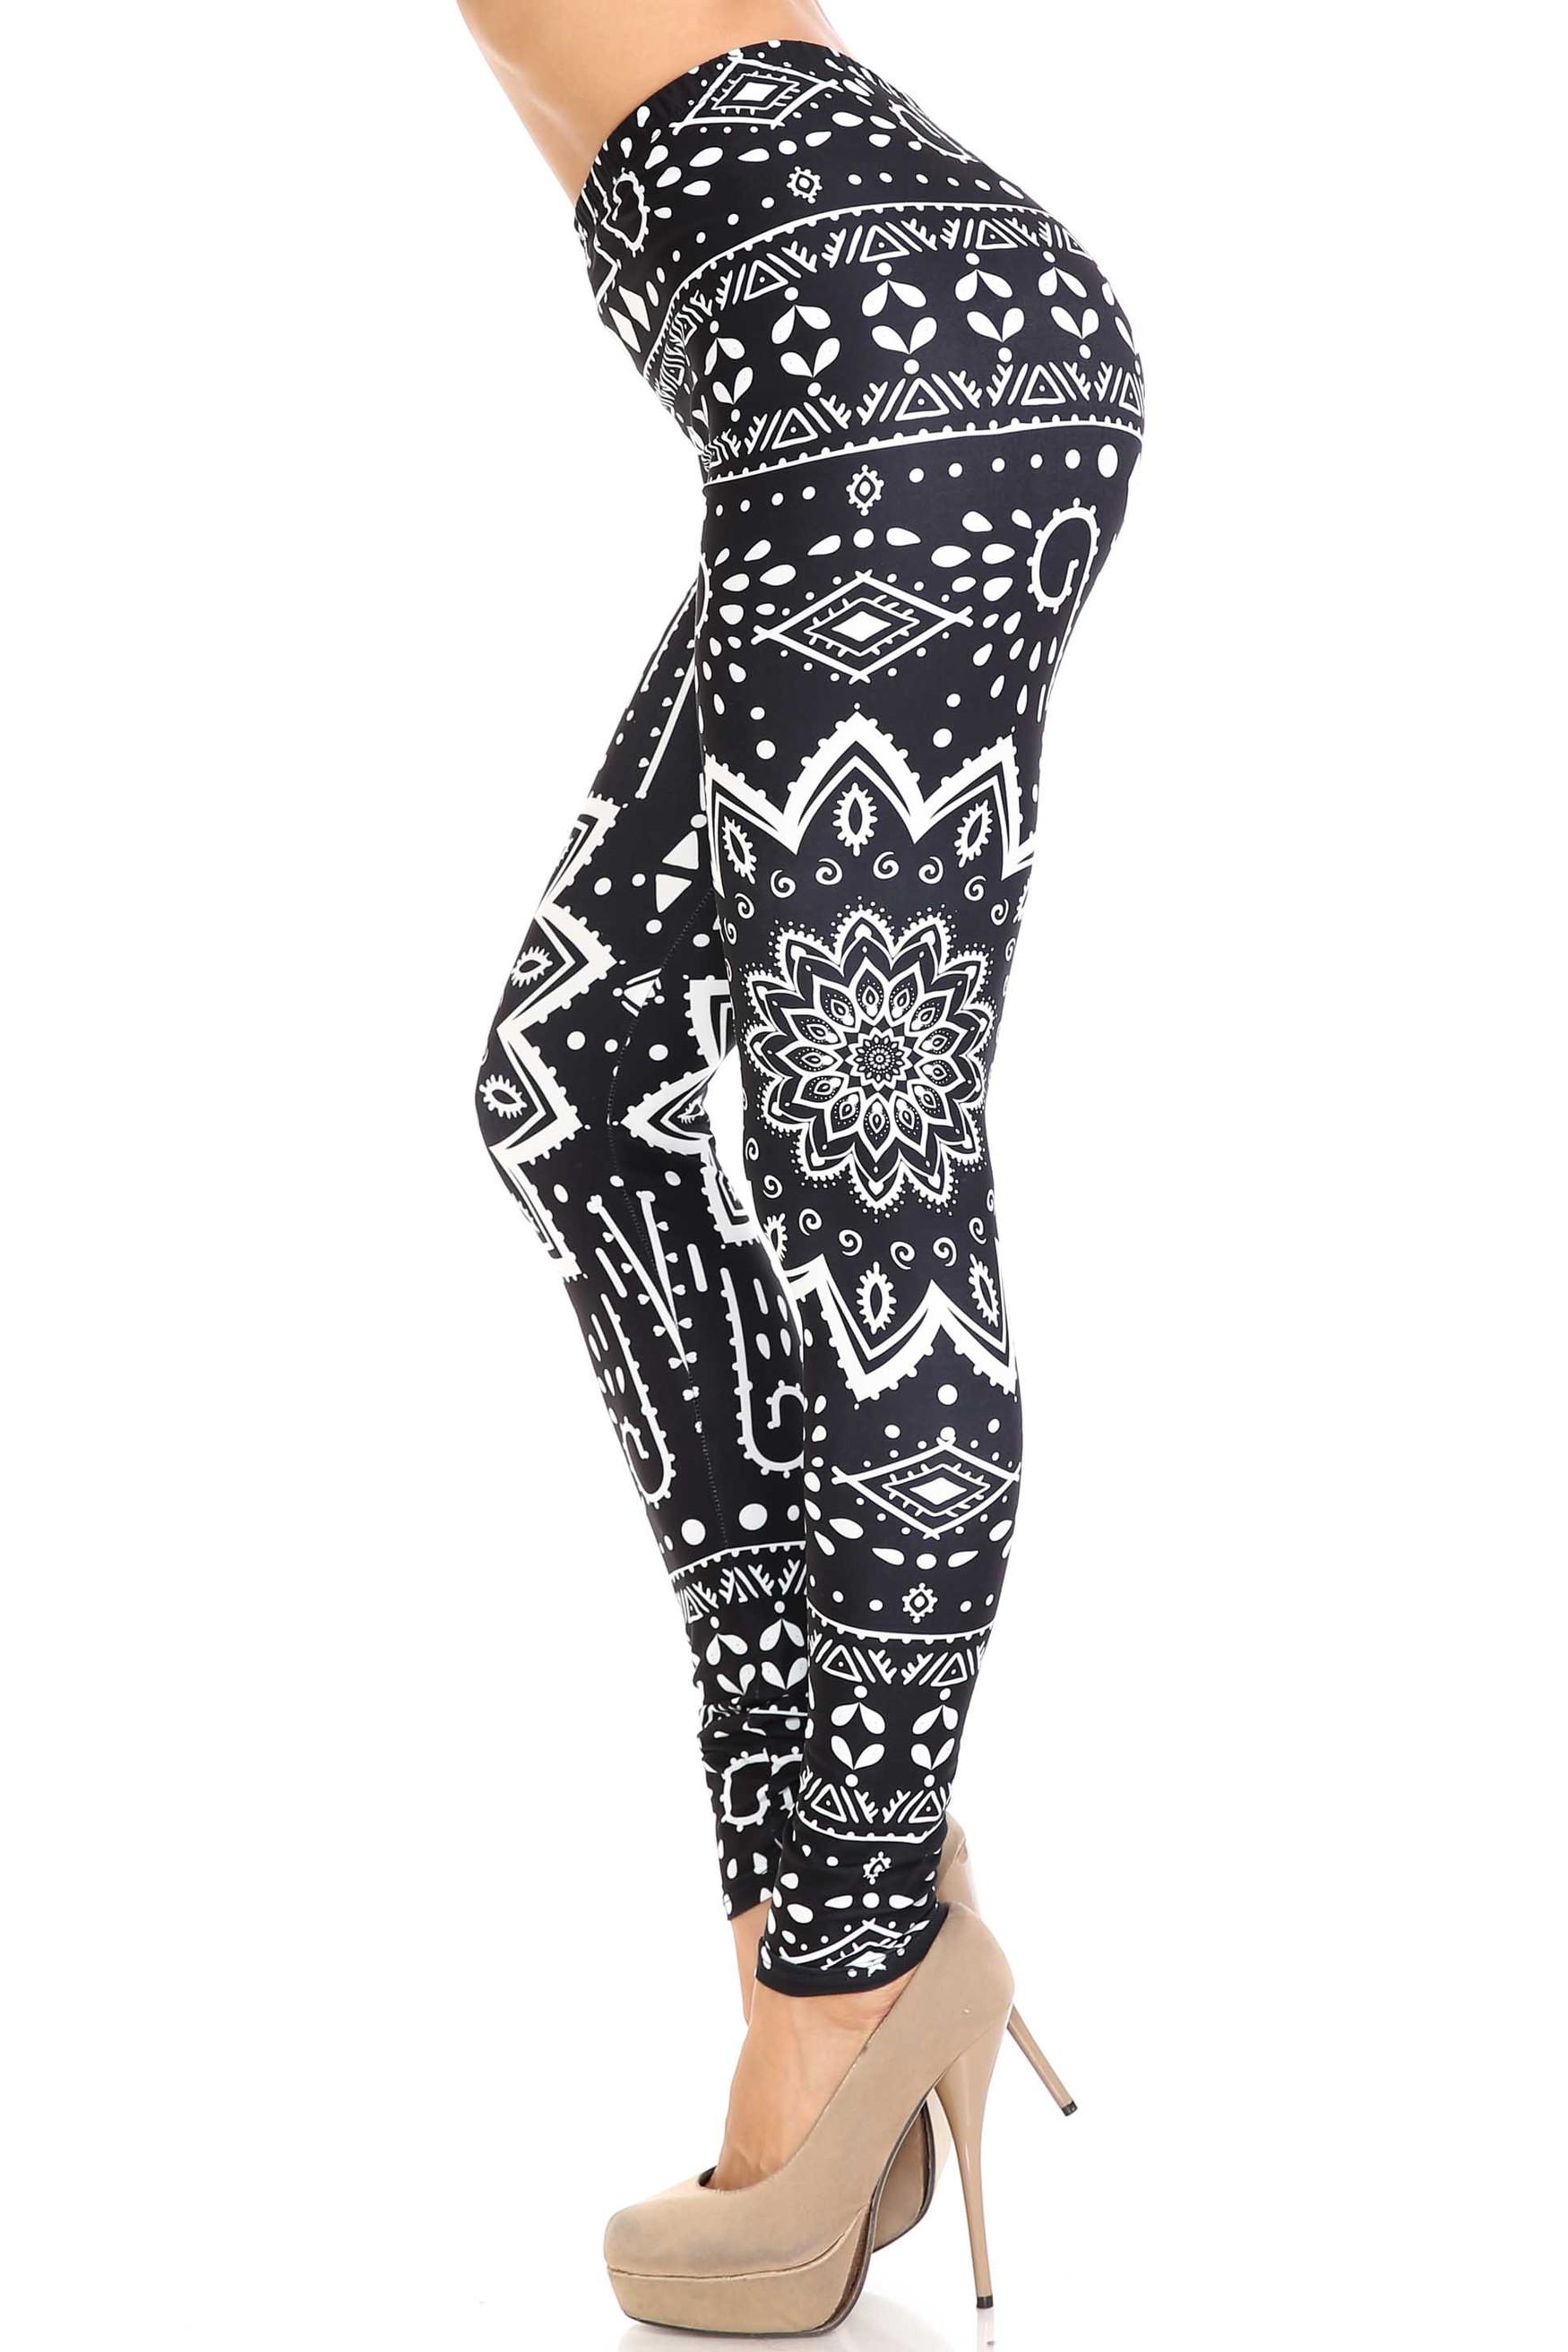 Creamy Soft Black Tribal Mandala Plus Size Leggings - By USA Fashion™